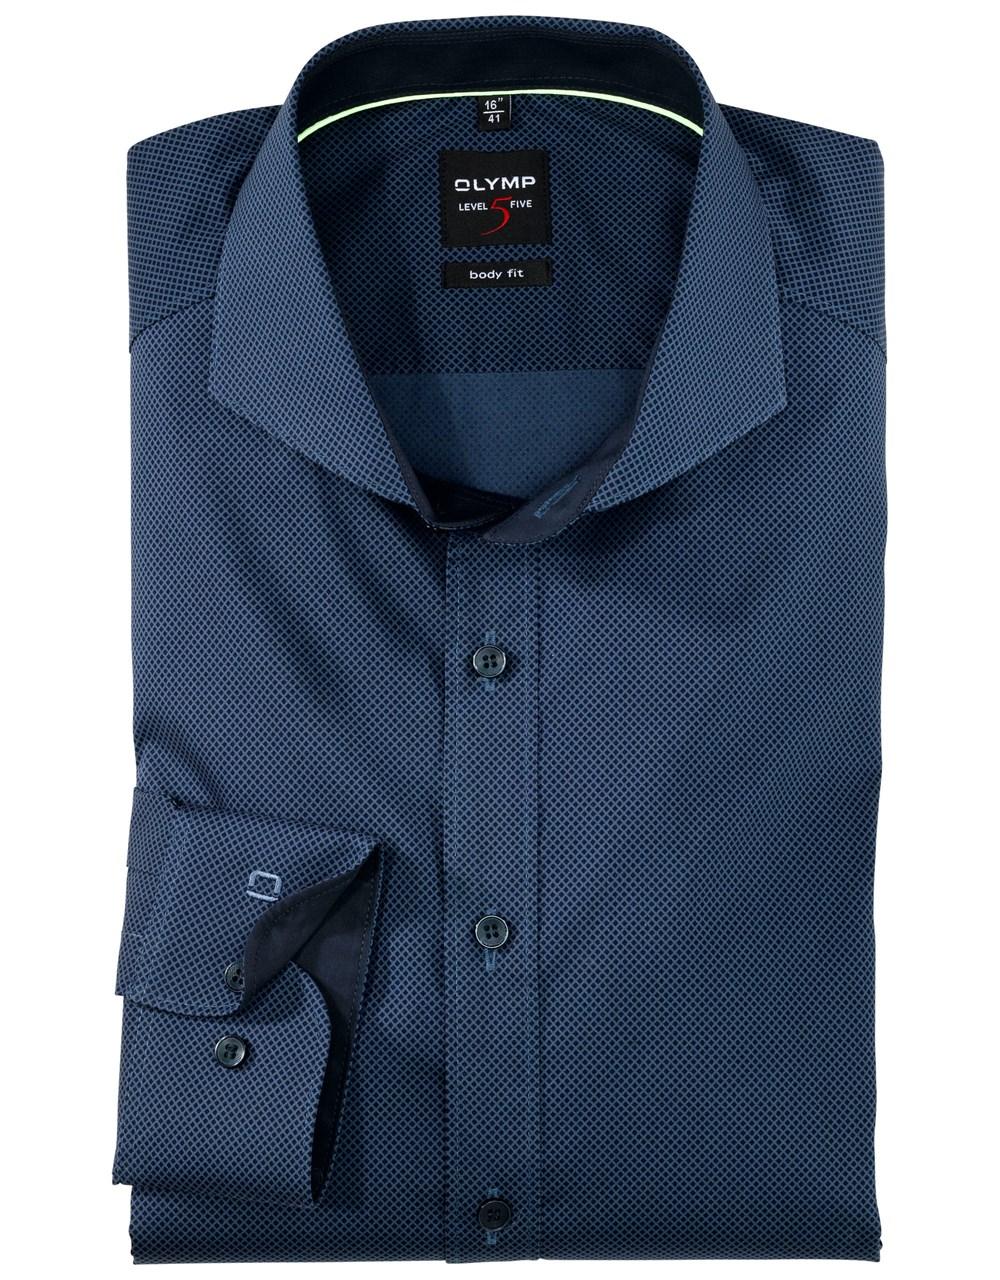 W M EGO. Olymp košile tmavě modrá se vzorkem bc12f4b49e